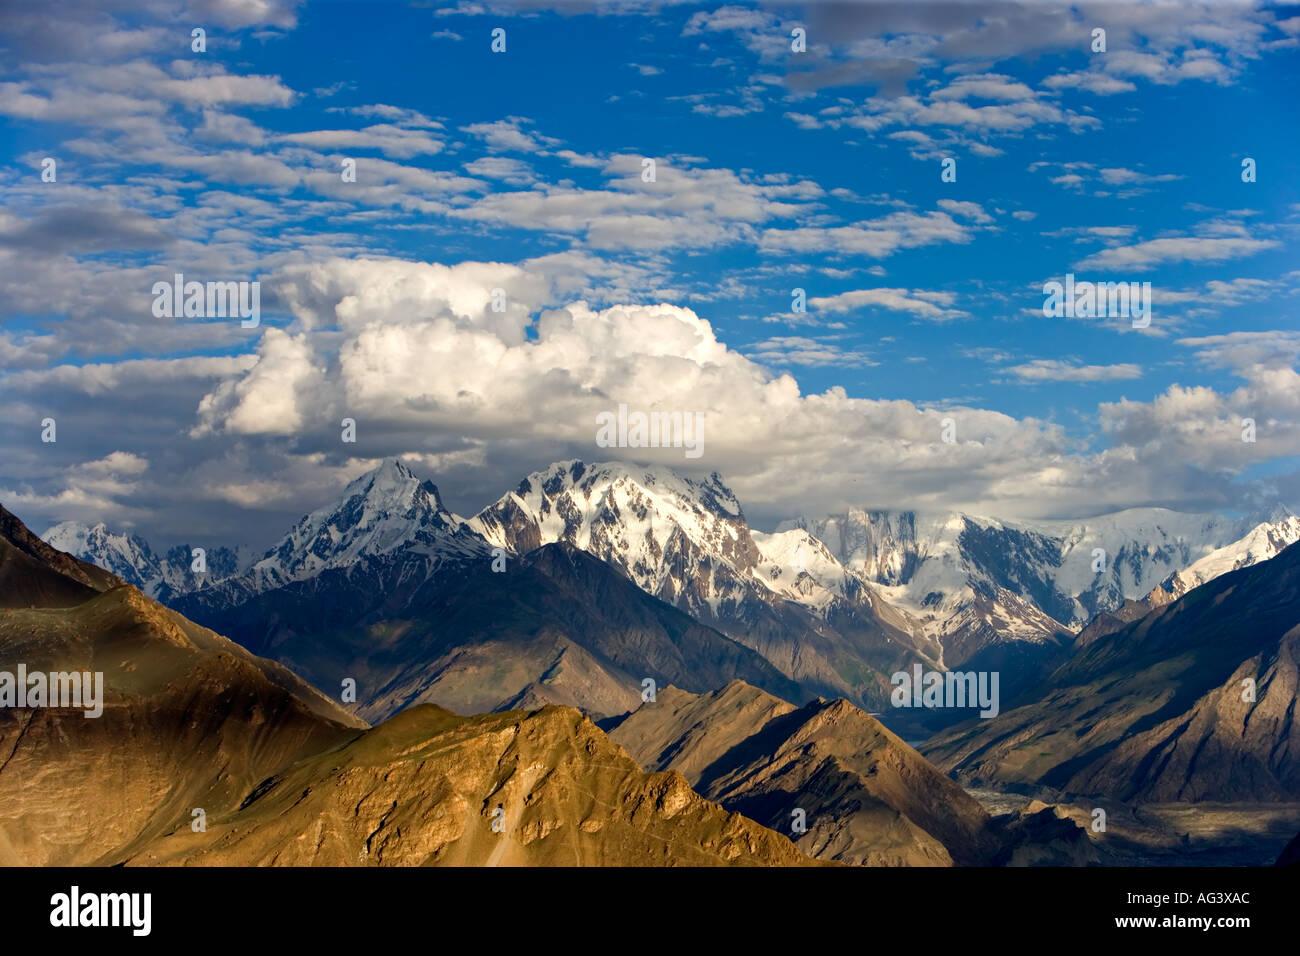 Spektakulären Bergkulisse der Hunza in Nordpakistan Stockbild